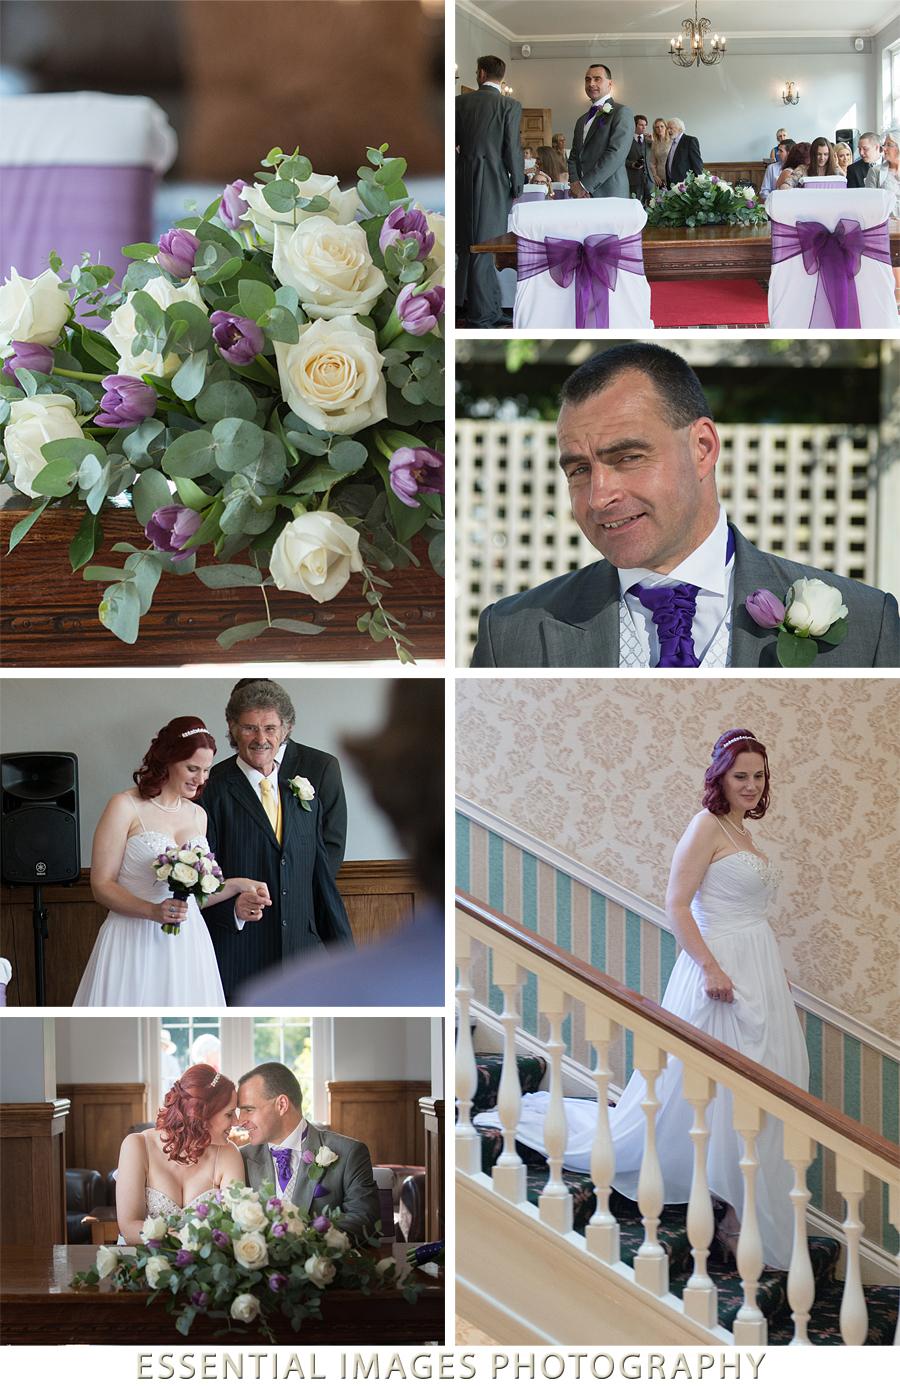 Wedding photographers Balmer Lawn